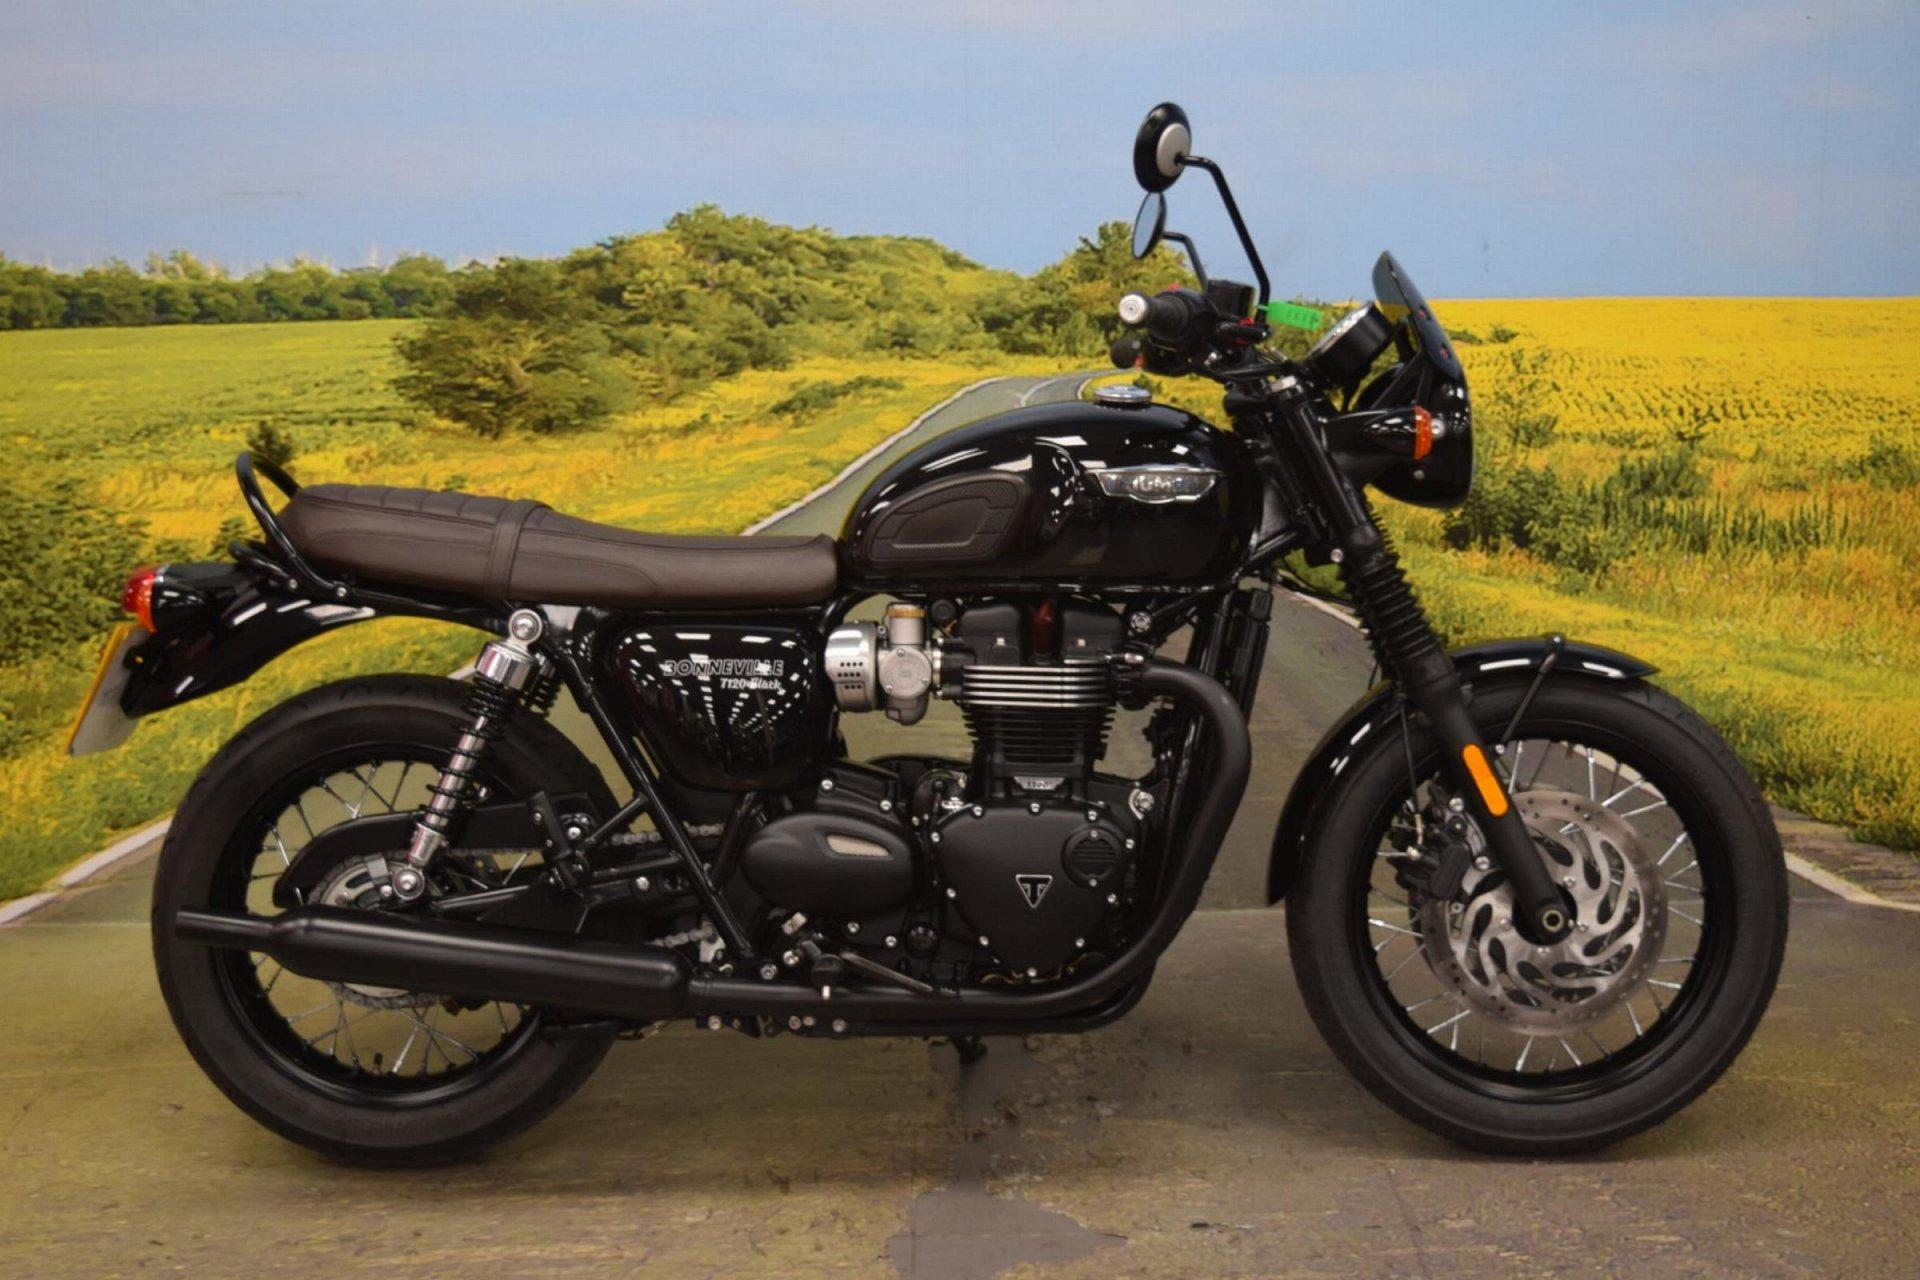 2017 Triumph Bonneville T120 Black for sale in Staffordshire